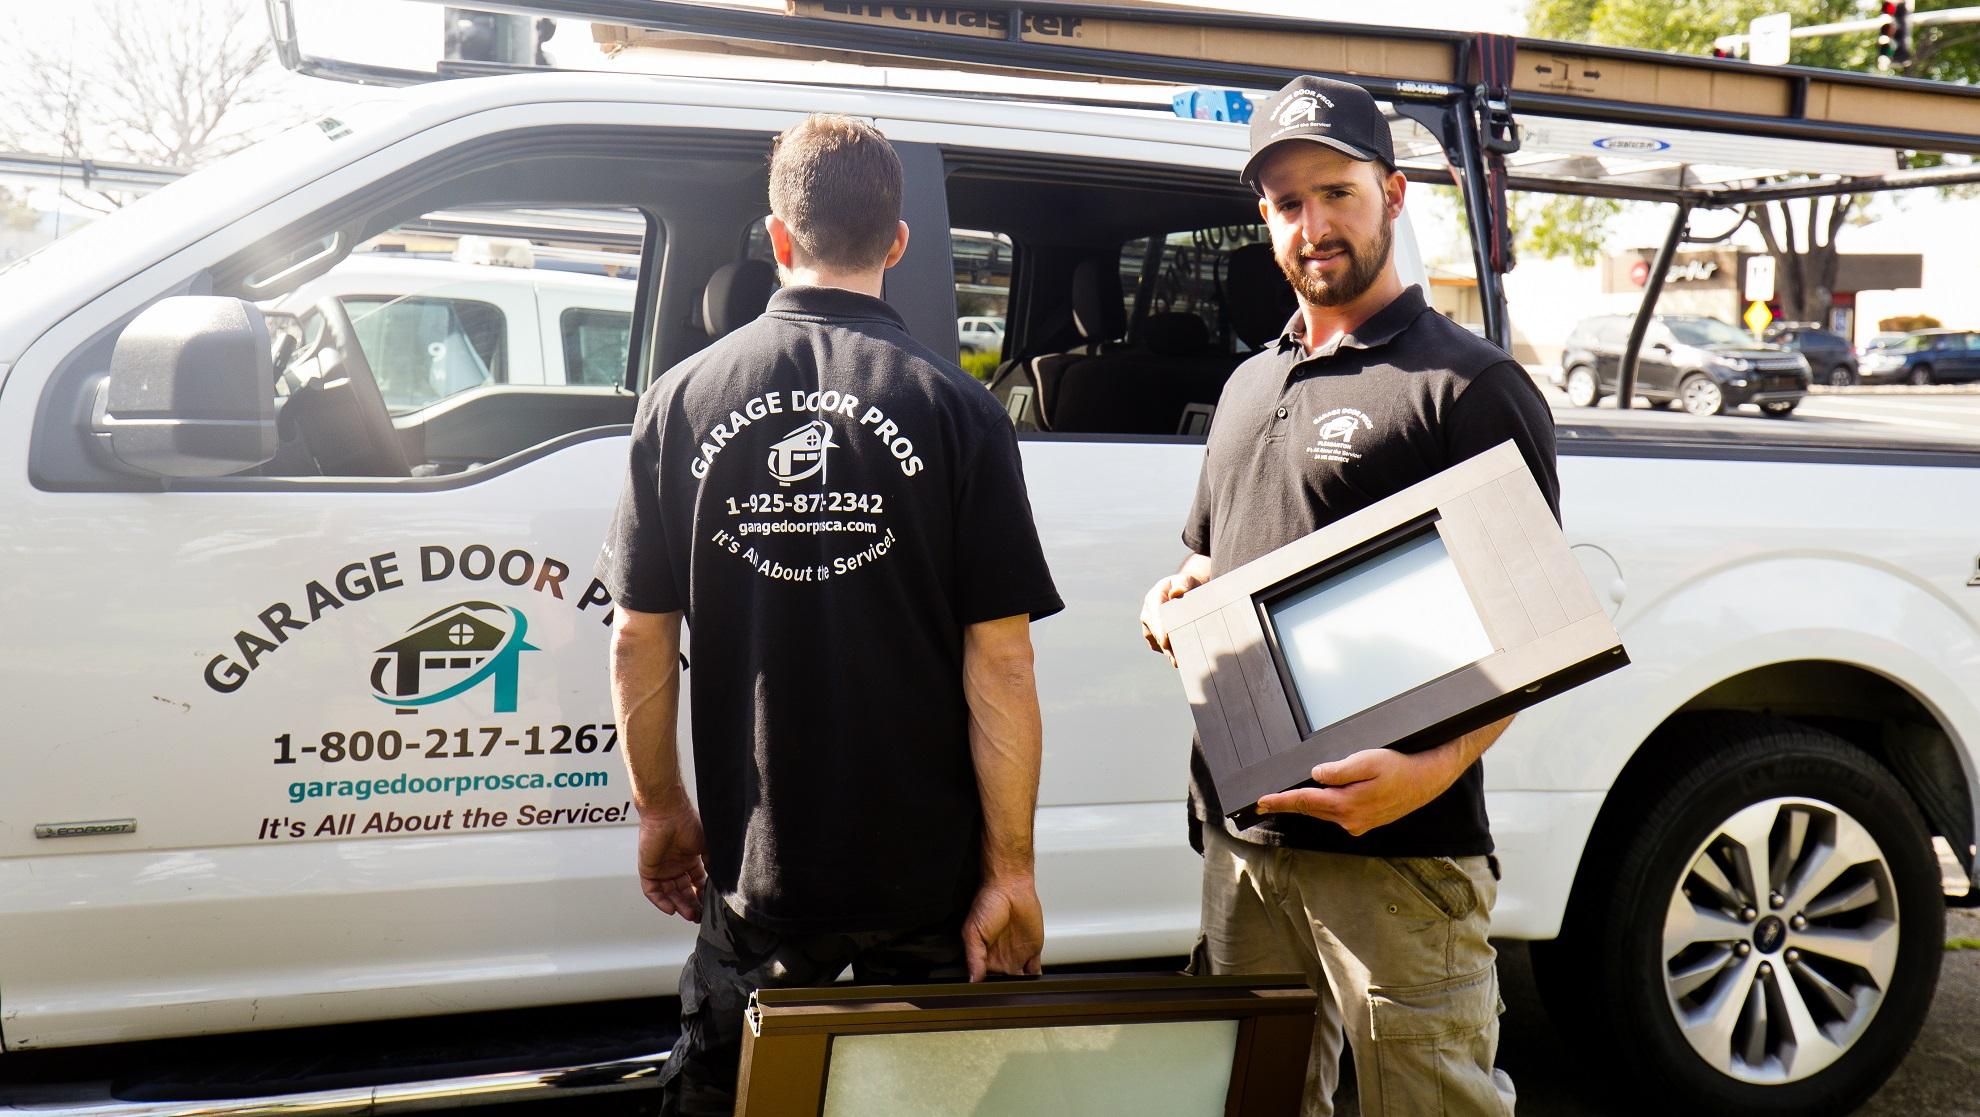 Garage Door Pros Announcing Totally Safe And Secure Garage Door Installation Services In Pleasanton